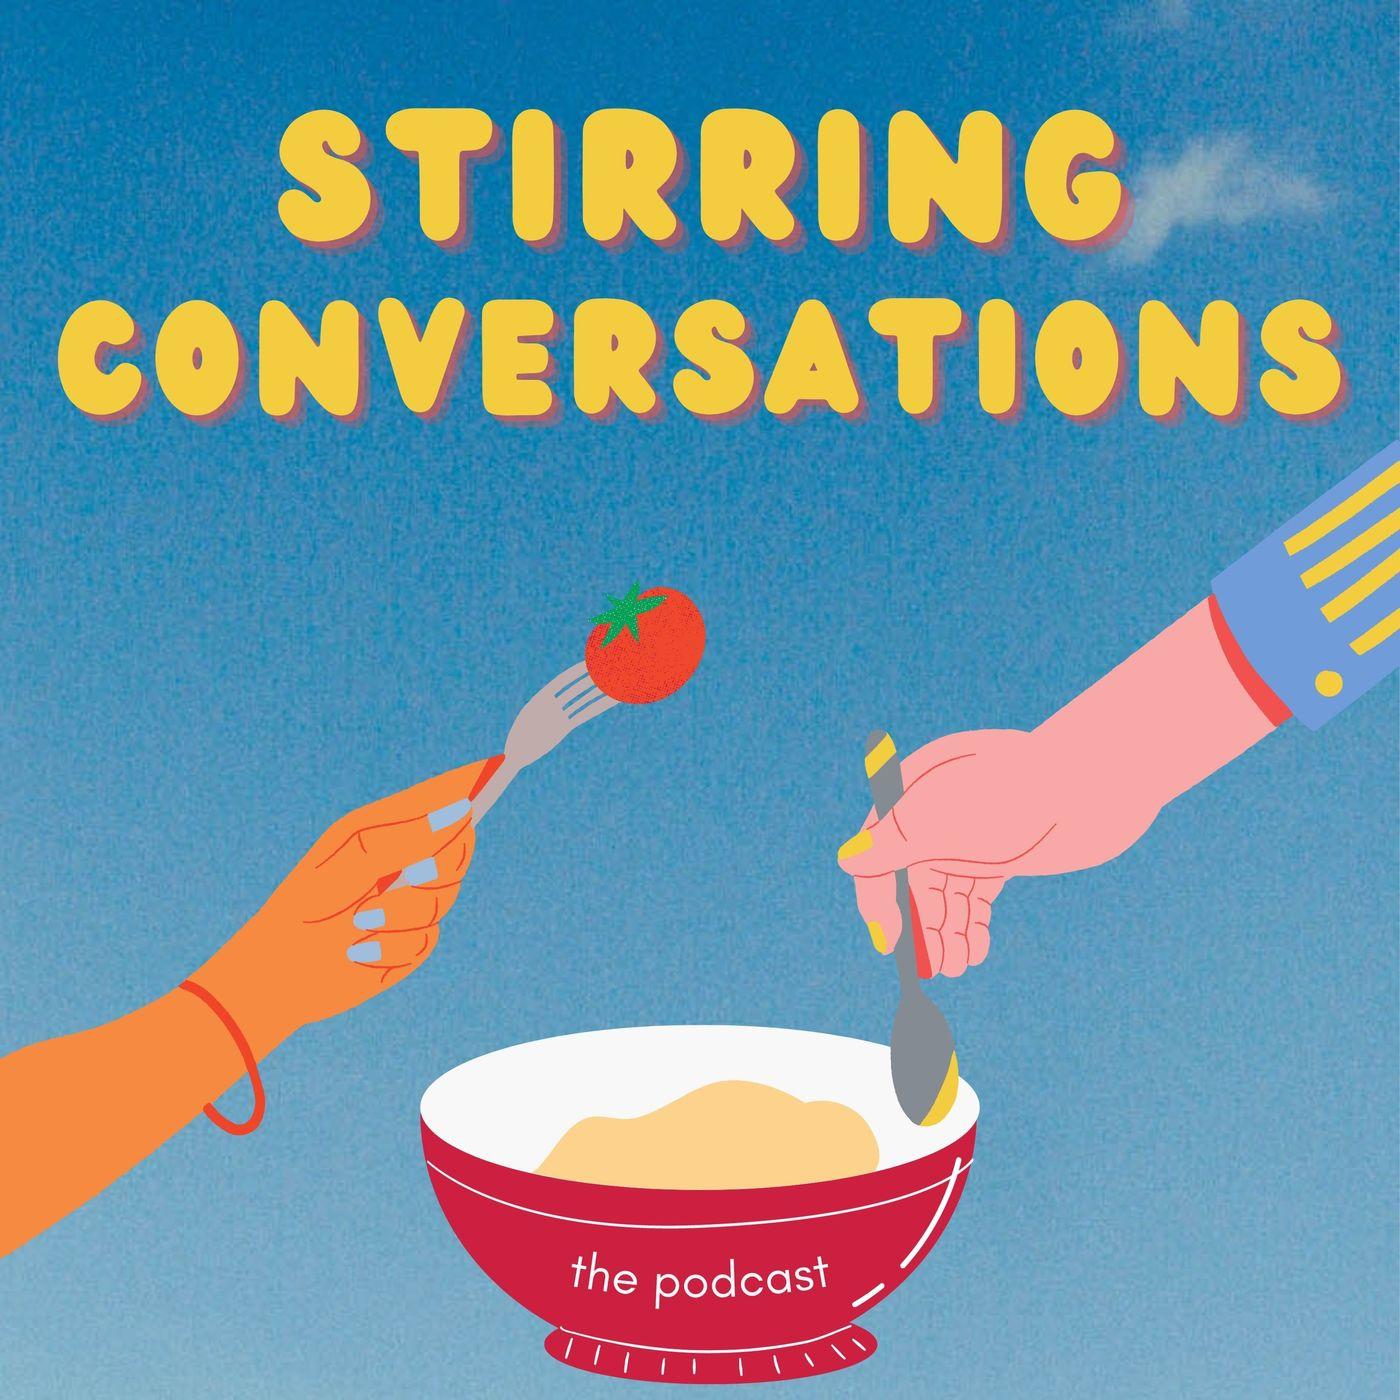 Stirring Conversations